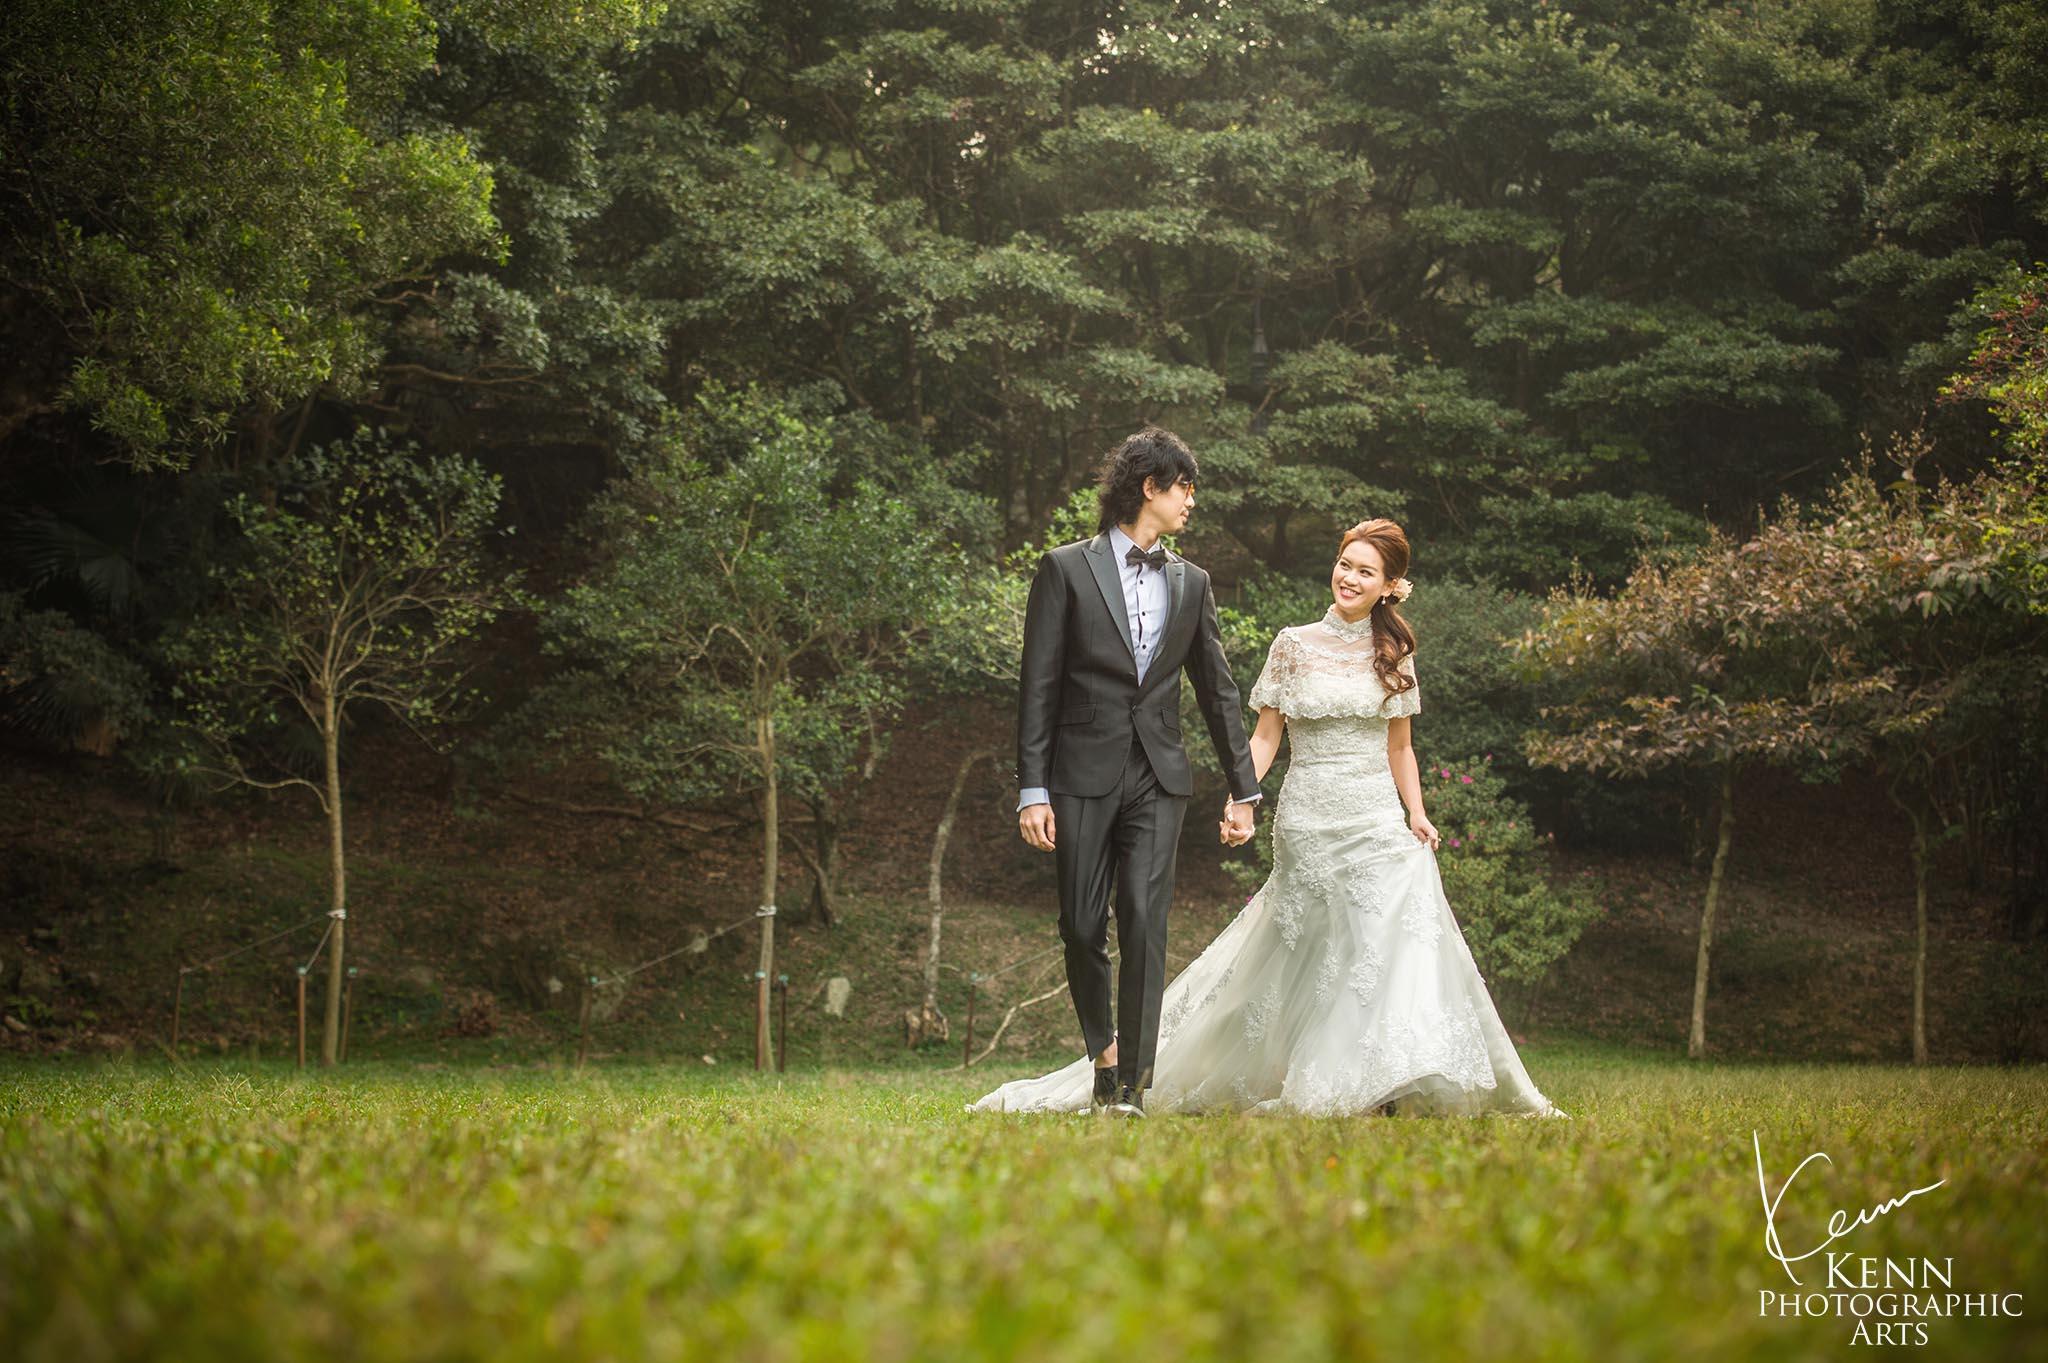 Rosanna & William HK Pre Wedding Photos